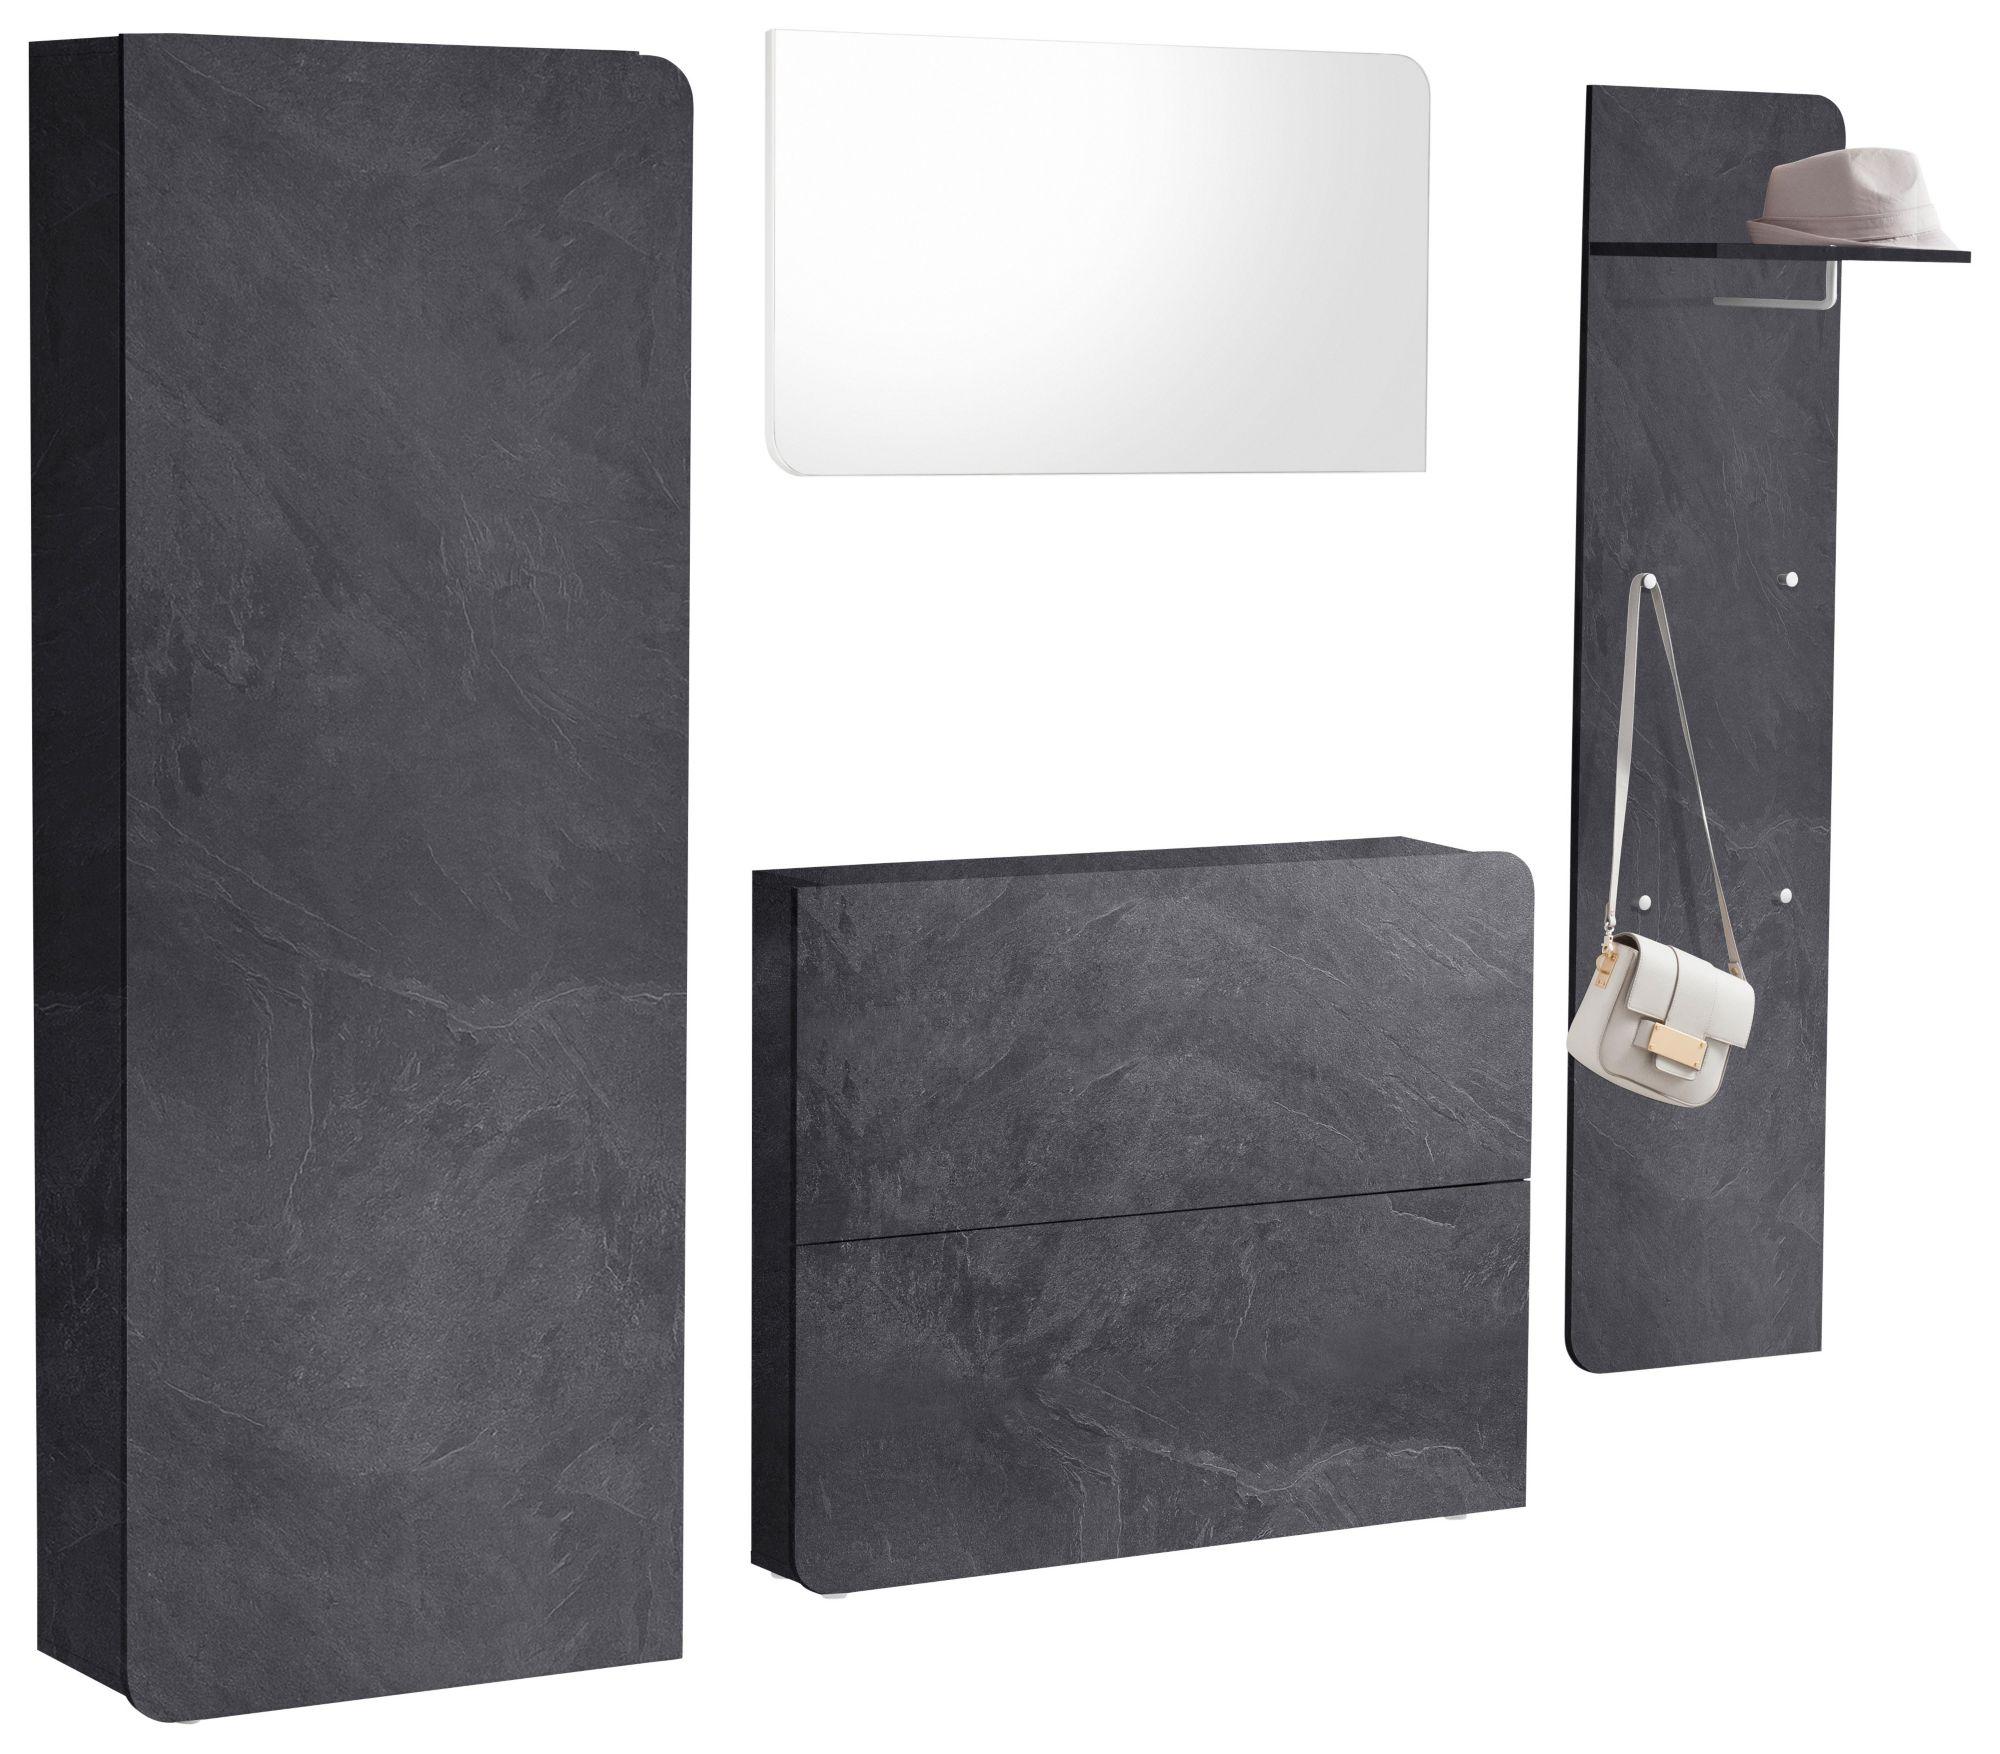 garderoben set goccia 4 tlg schwab versand garderobe flur. Black Bedroom Furniture Sets. Home Design Ideas